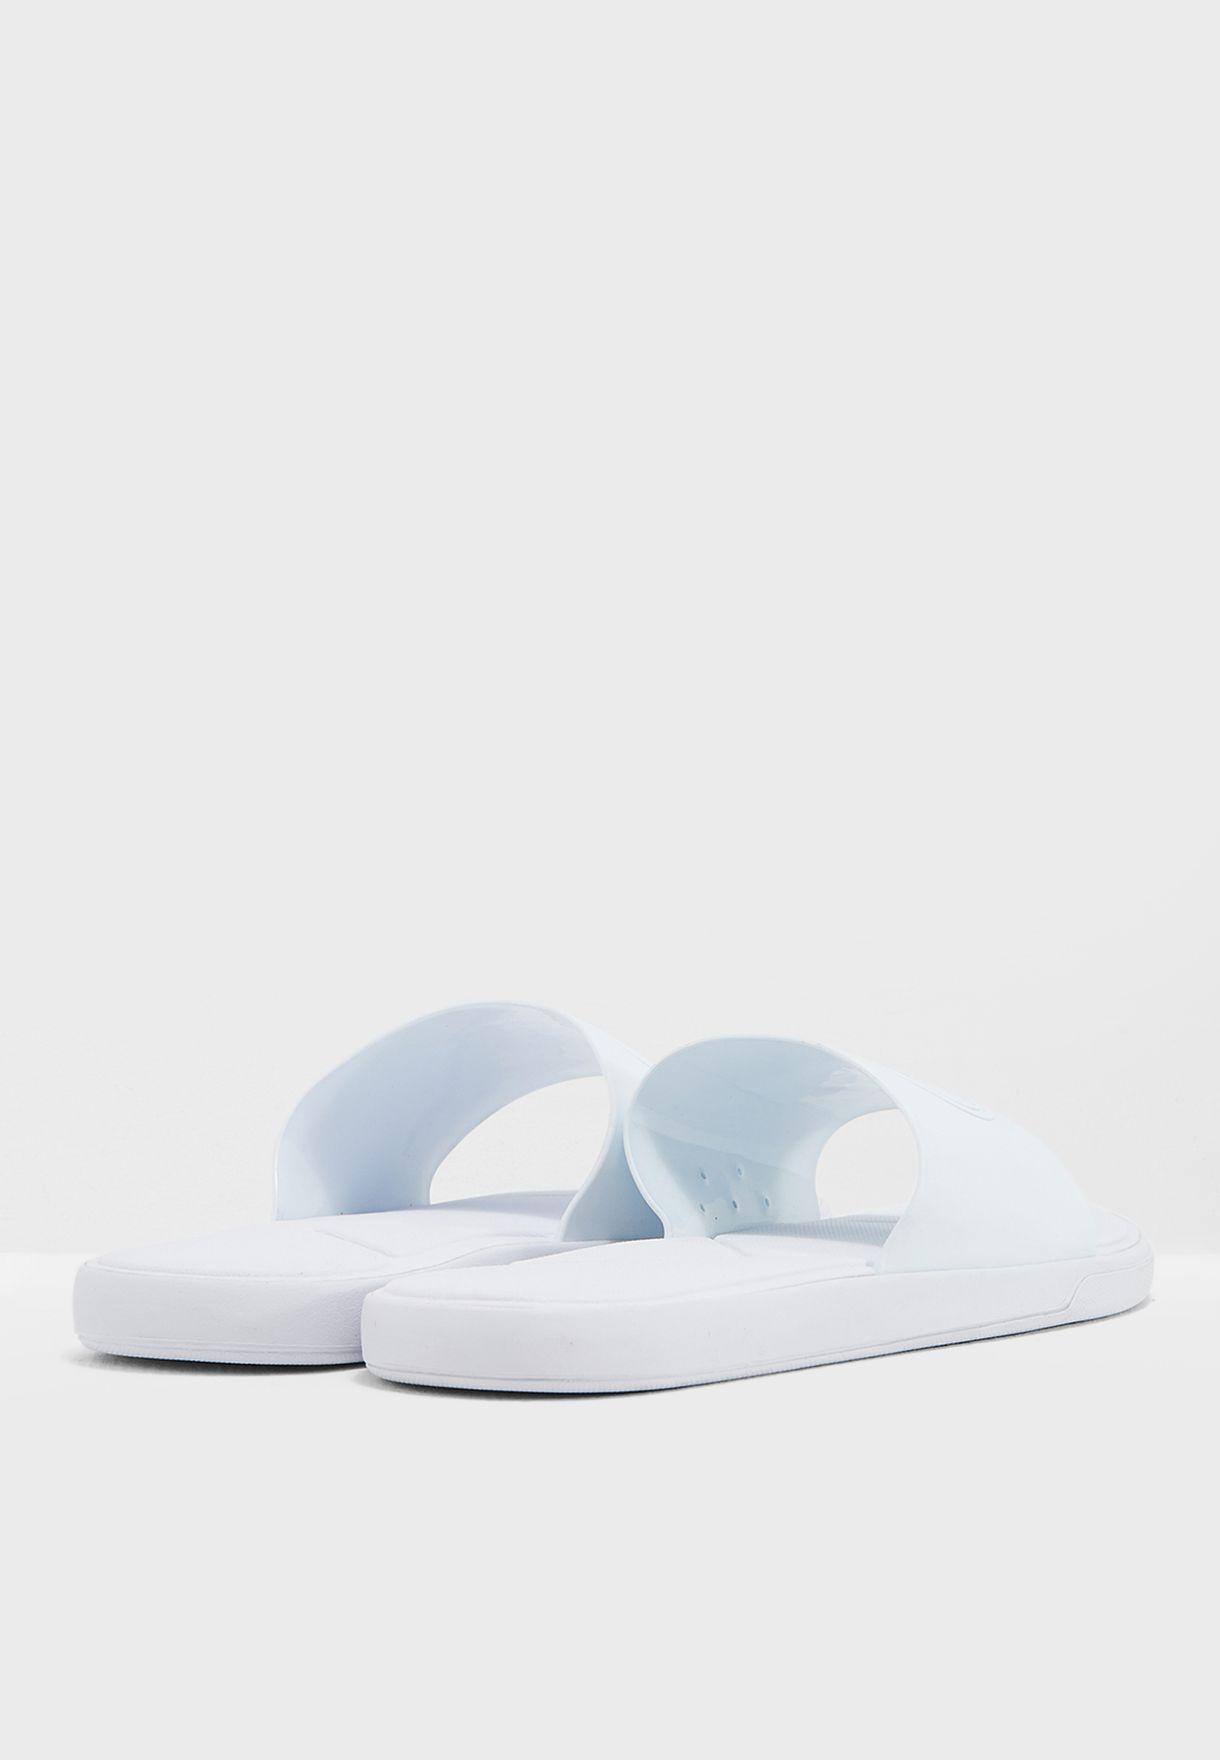 L.30 318 1 Caw Sandal